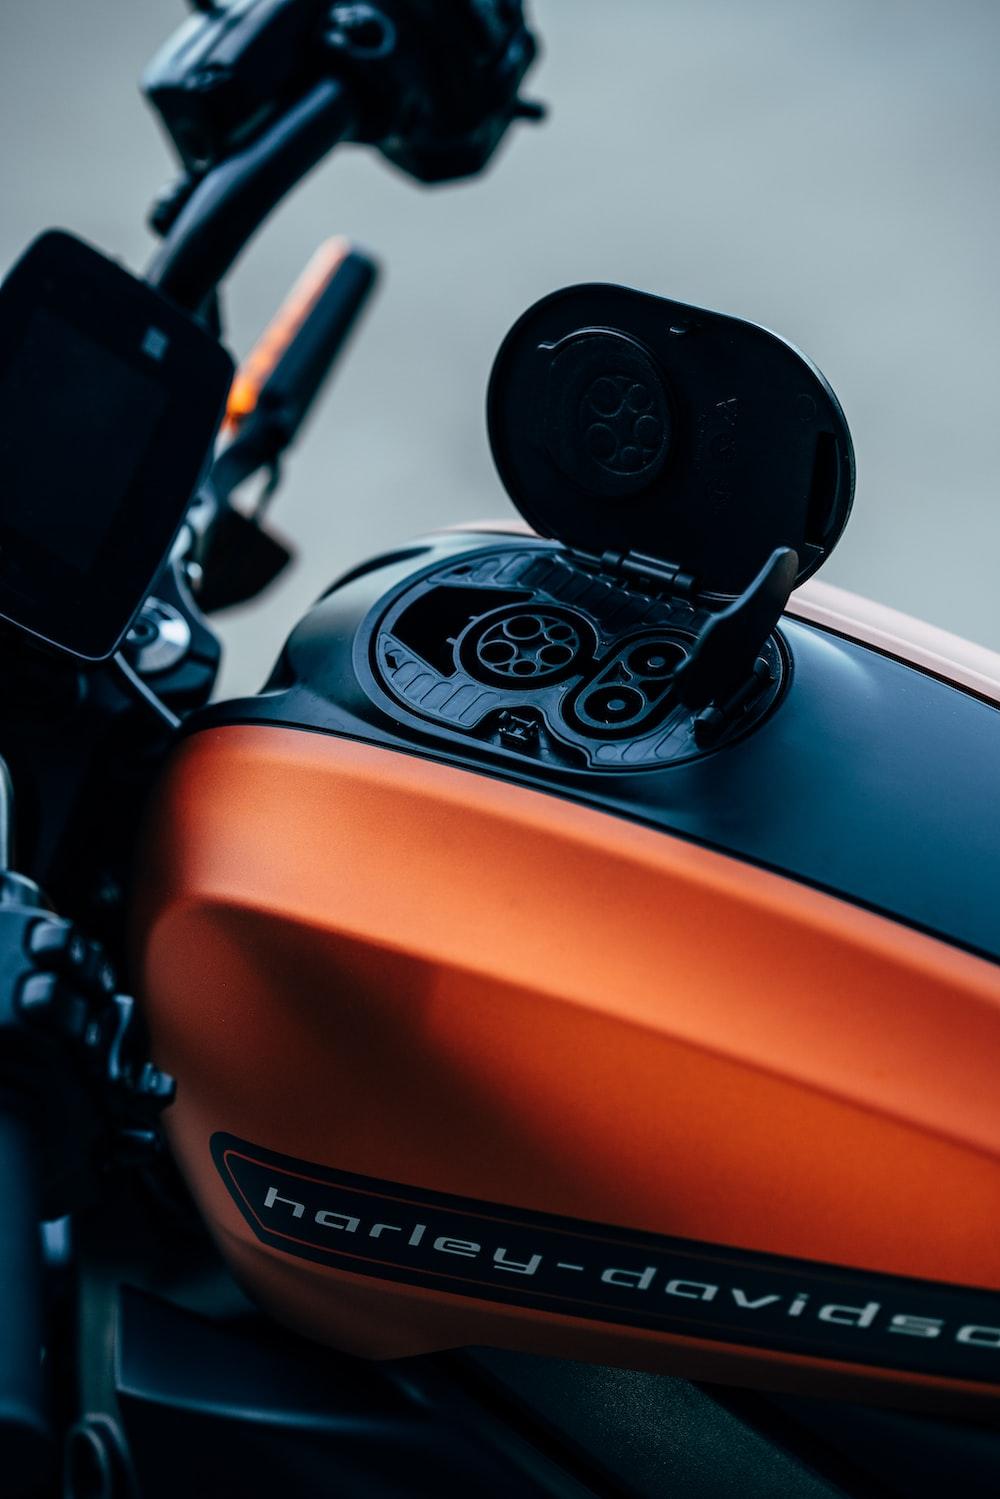 orange and black Harley-Davidson motorcycle